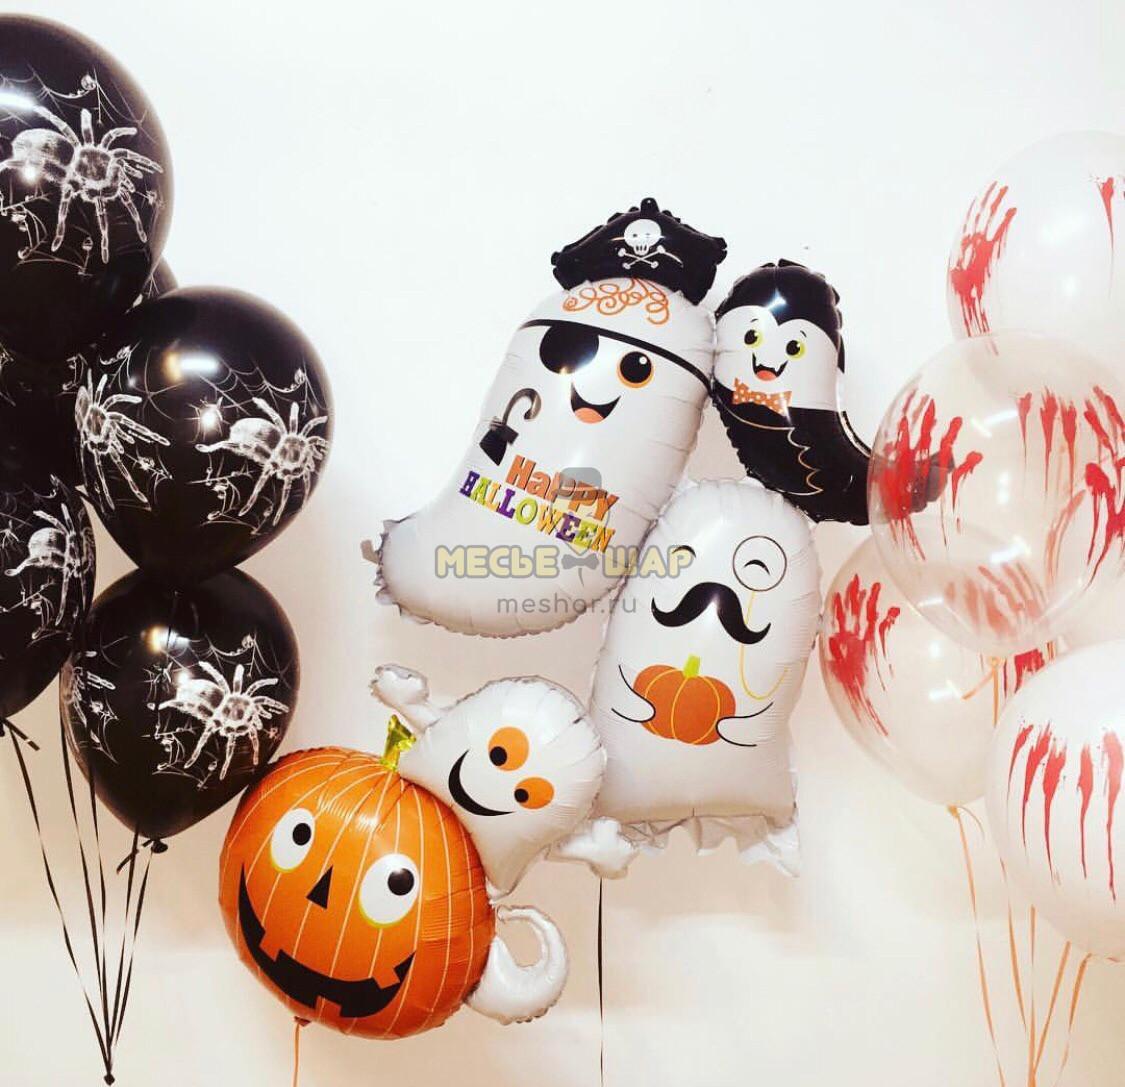 Веселый хеллоуин, ура